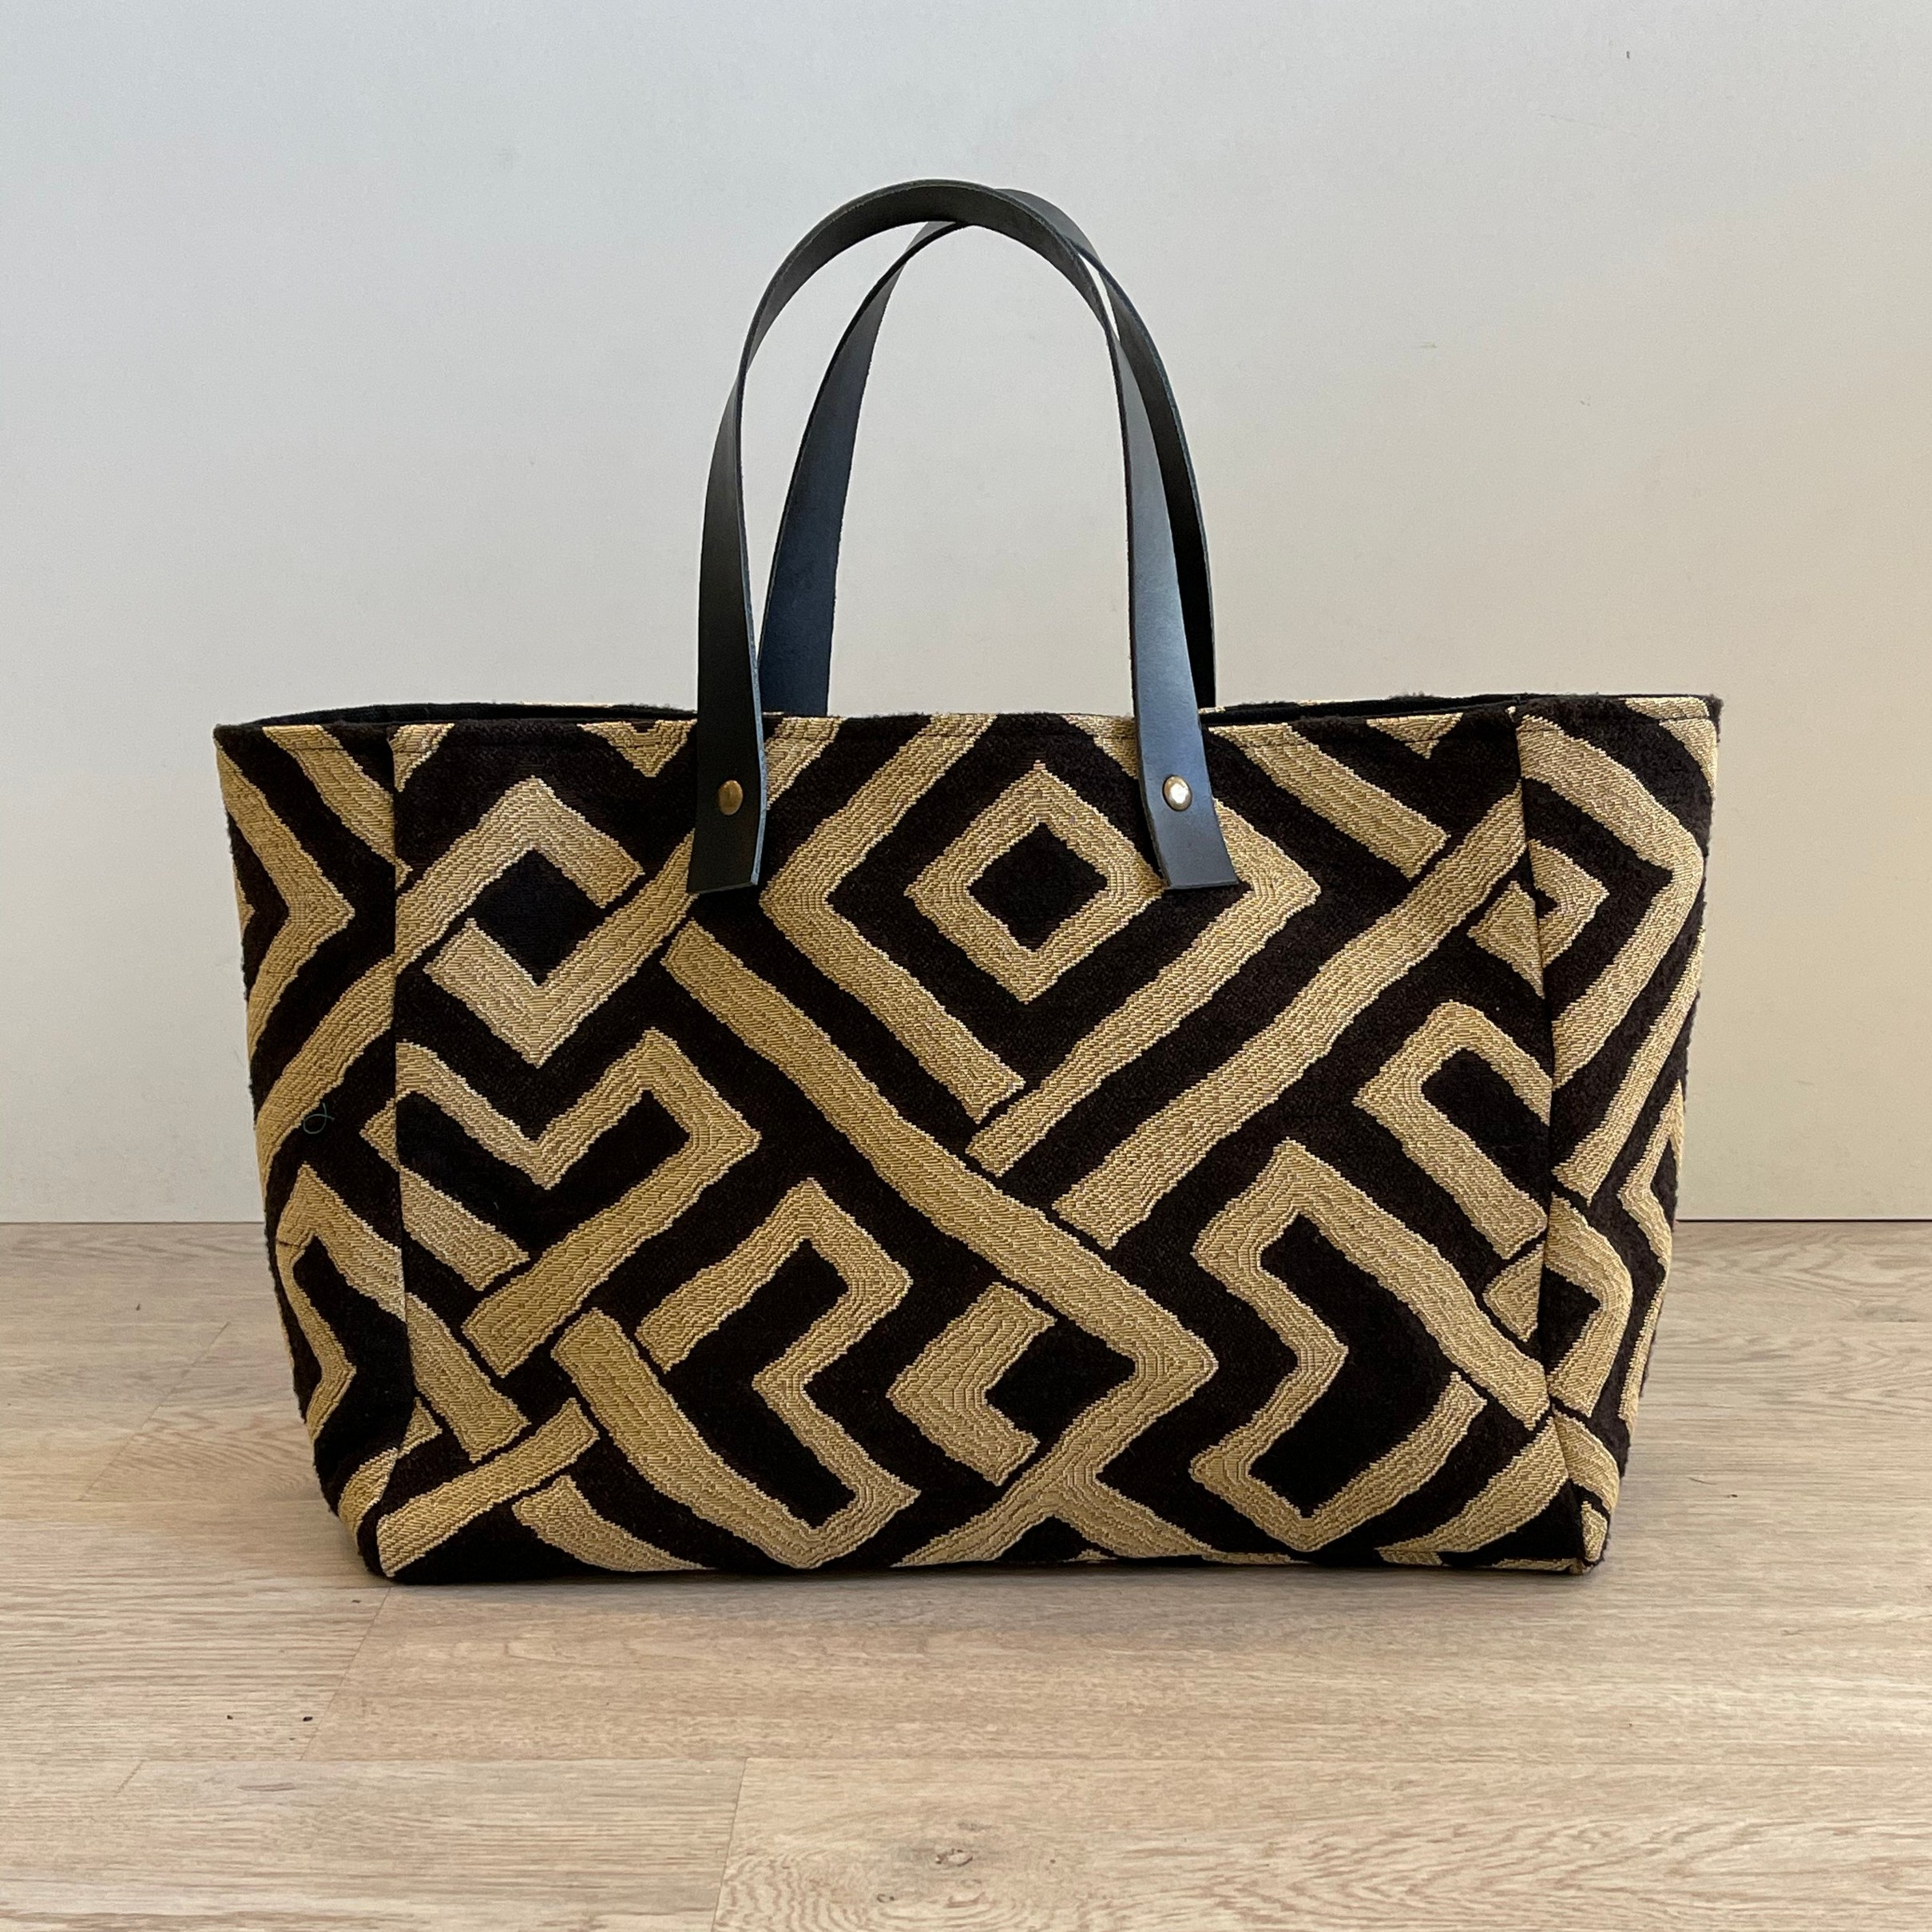 XL Bag Cape Town